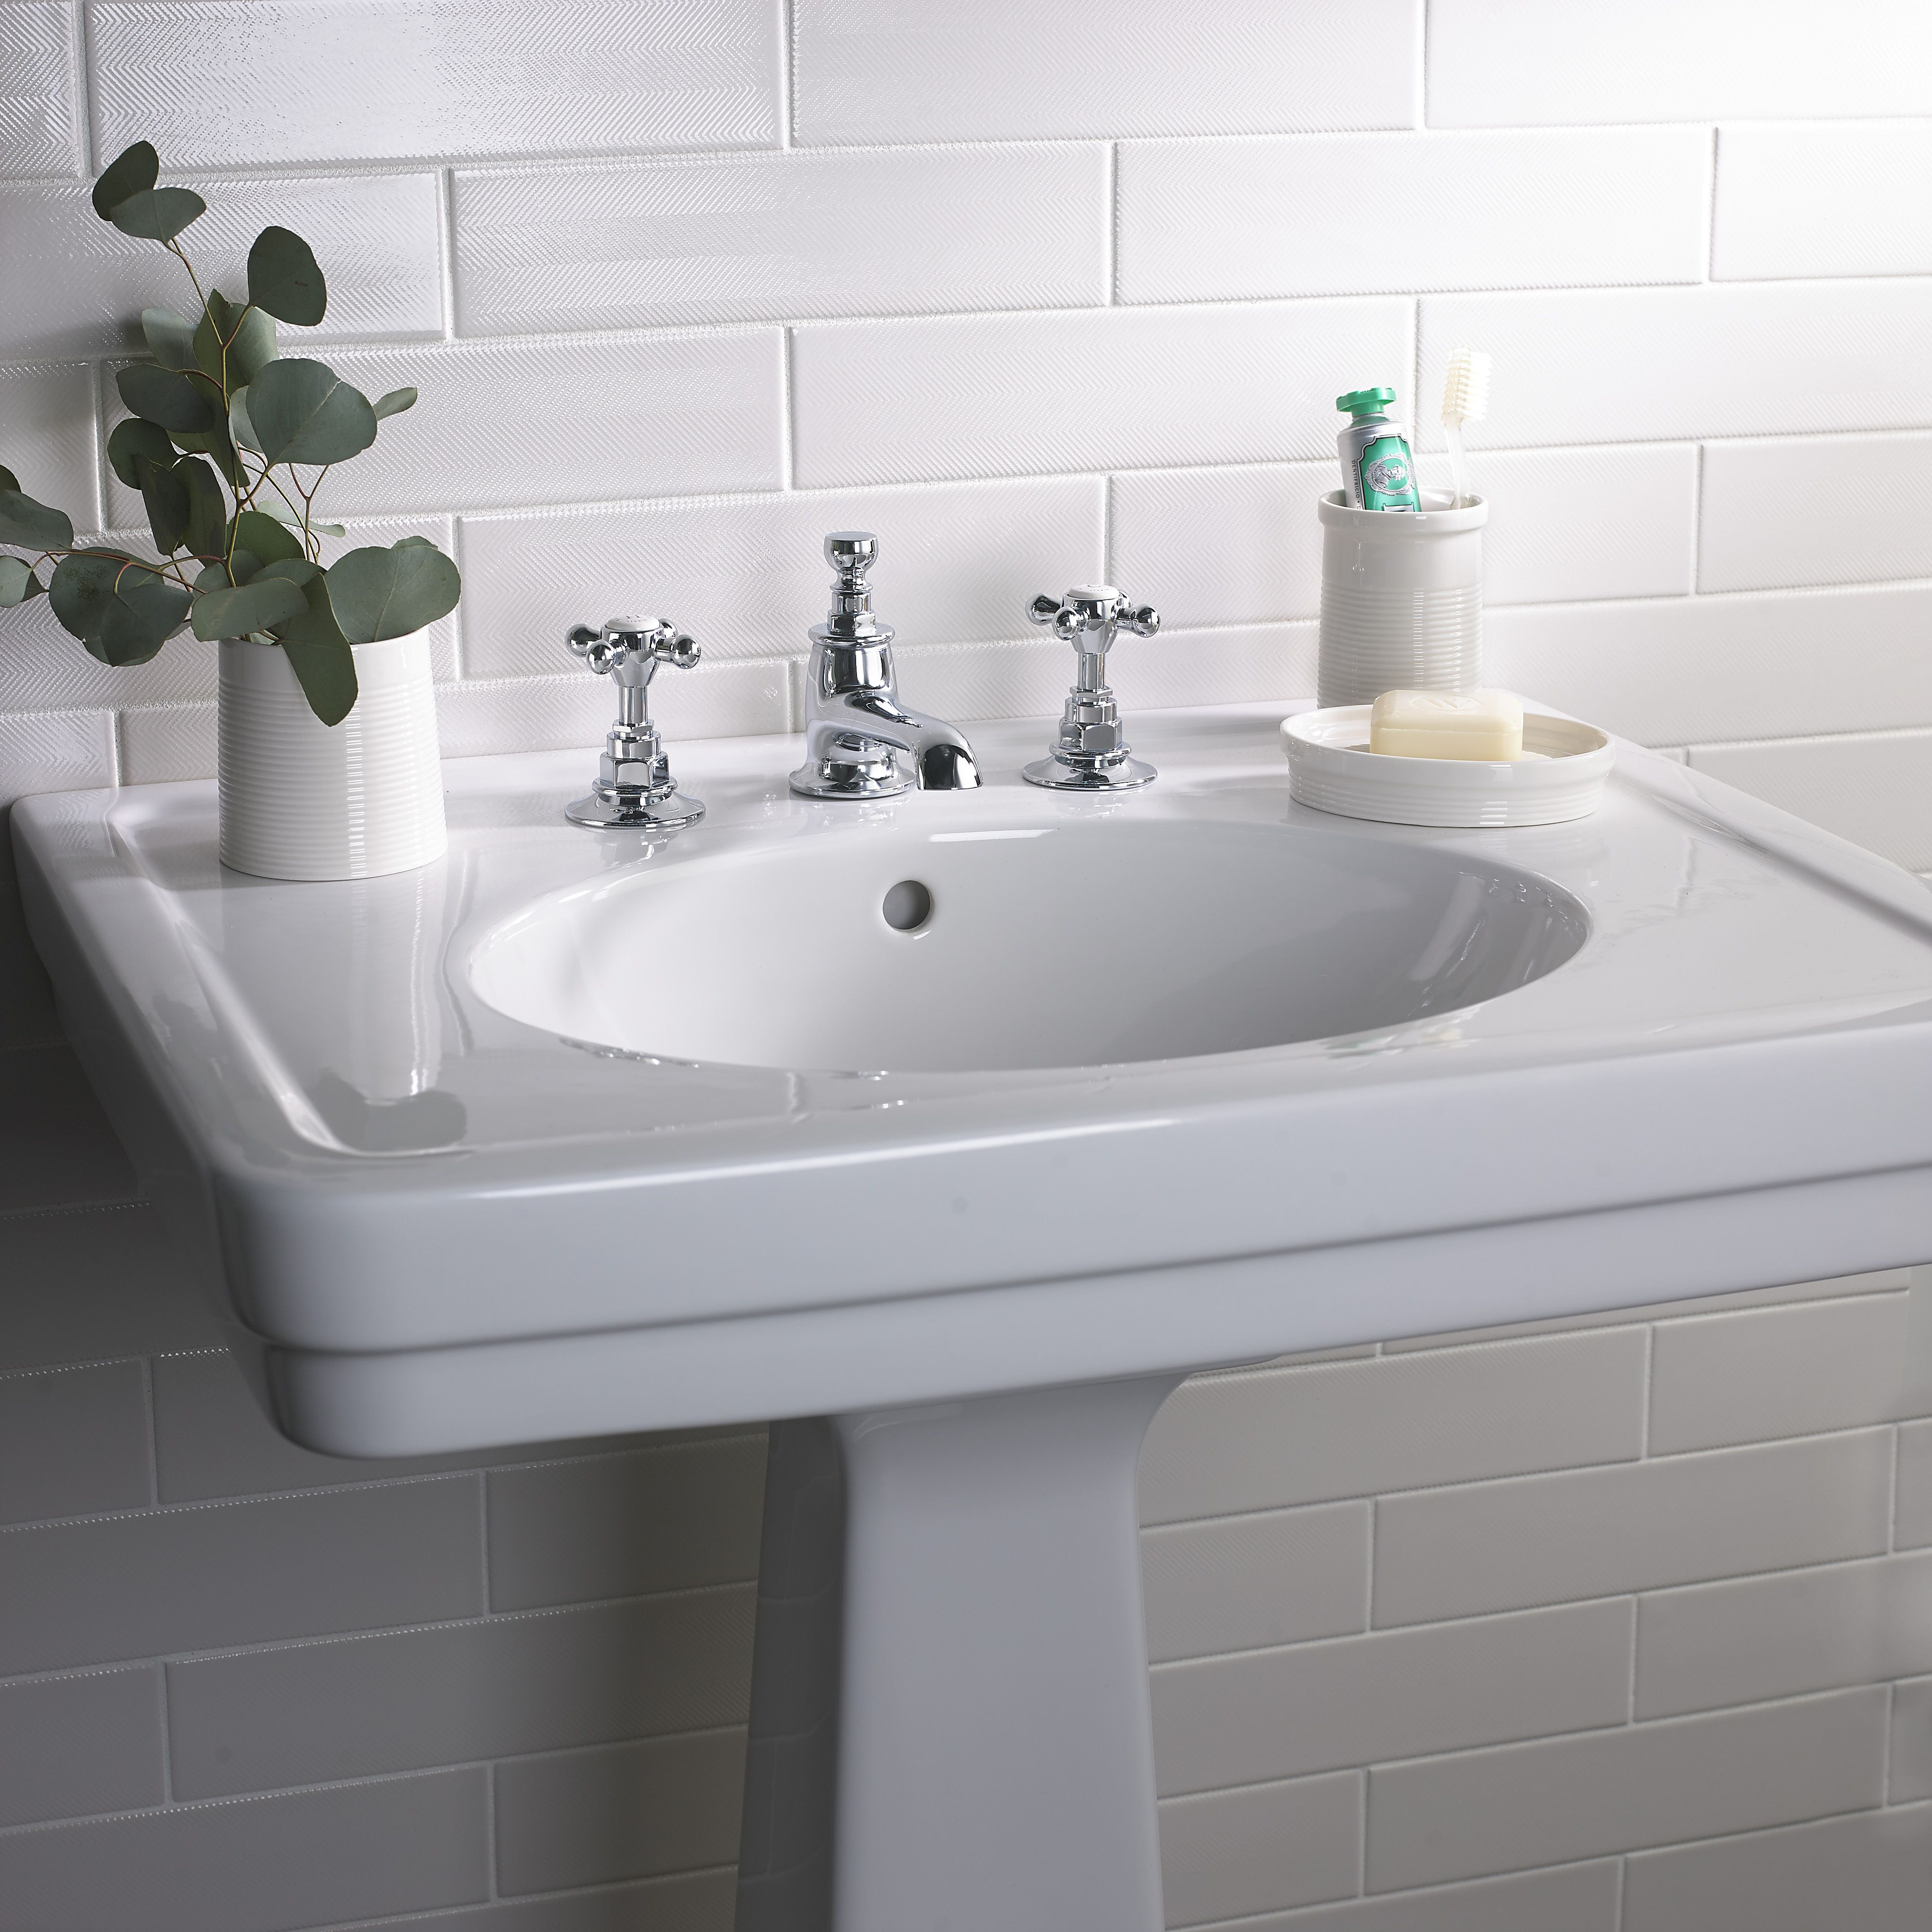 Alden Fine Fire Clay Vitreous China Single Pedestal Lavatory Sink Simple Bathroom Designs Classic Bathroom Design Bathroom Faucets Chrome